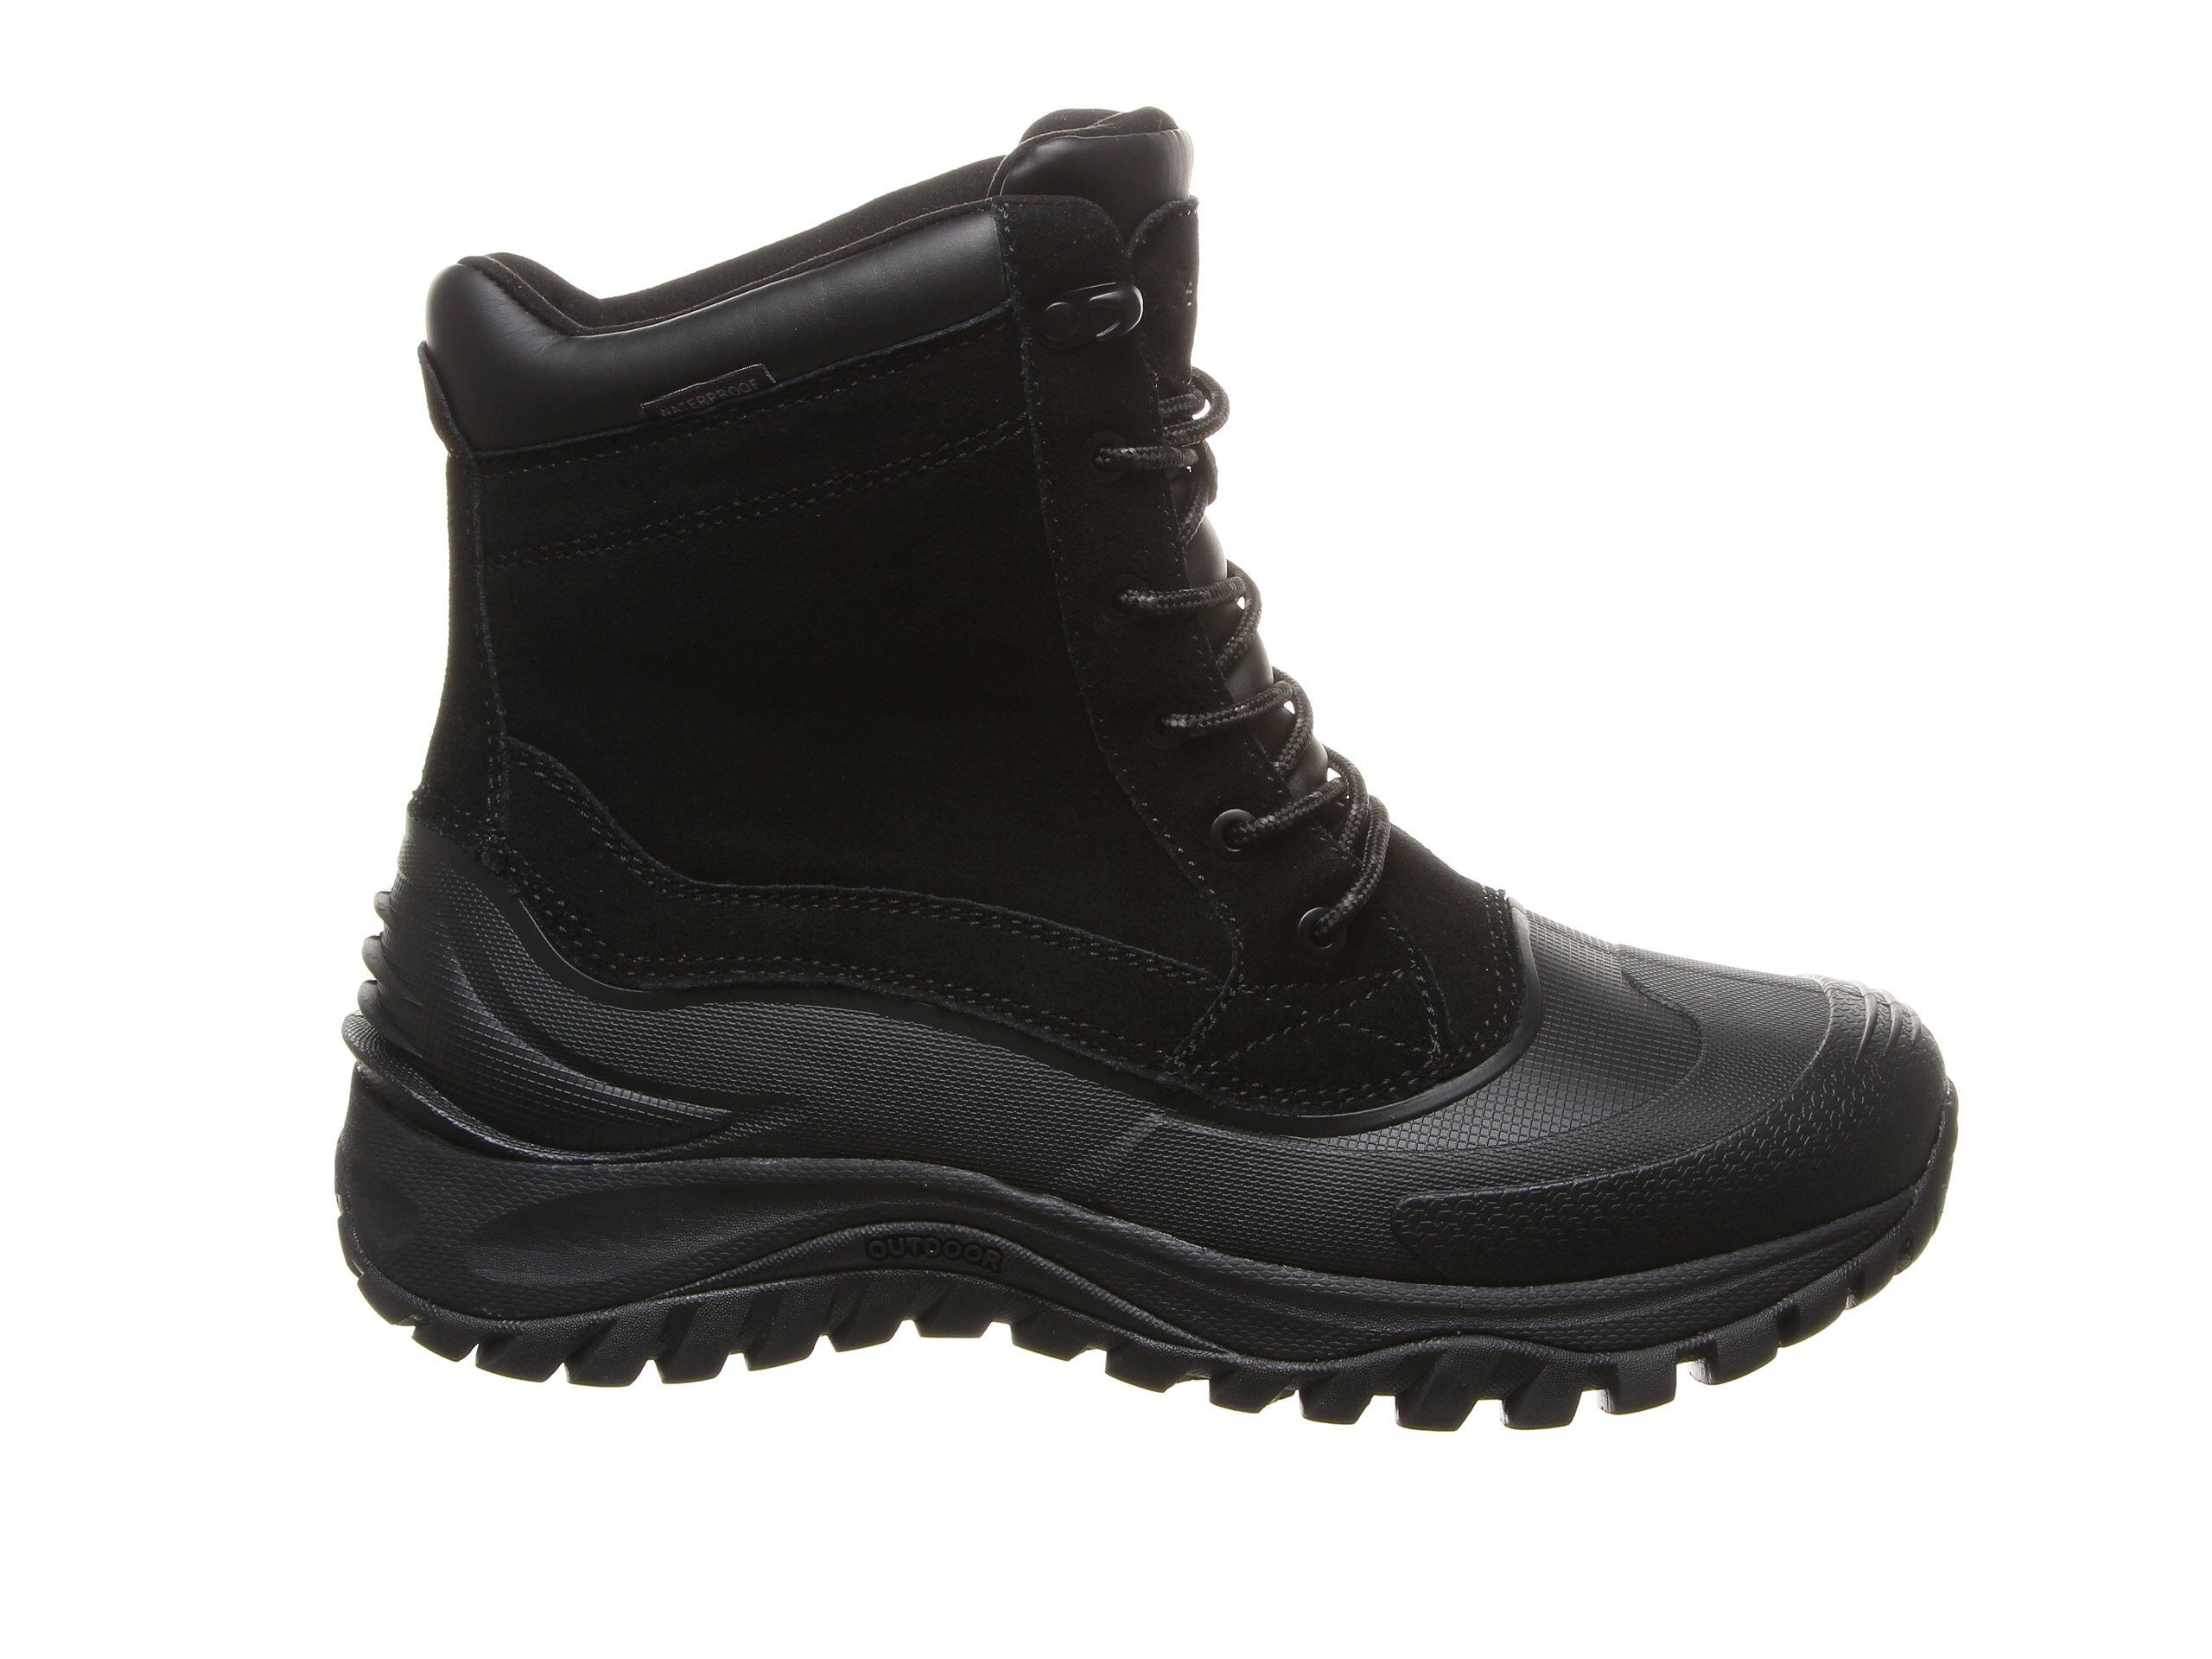 Men's Bearpaw Teton Winter Boots Black